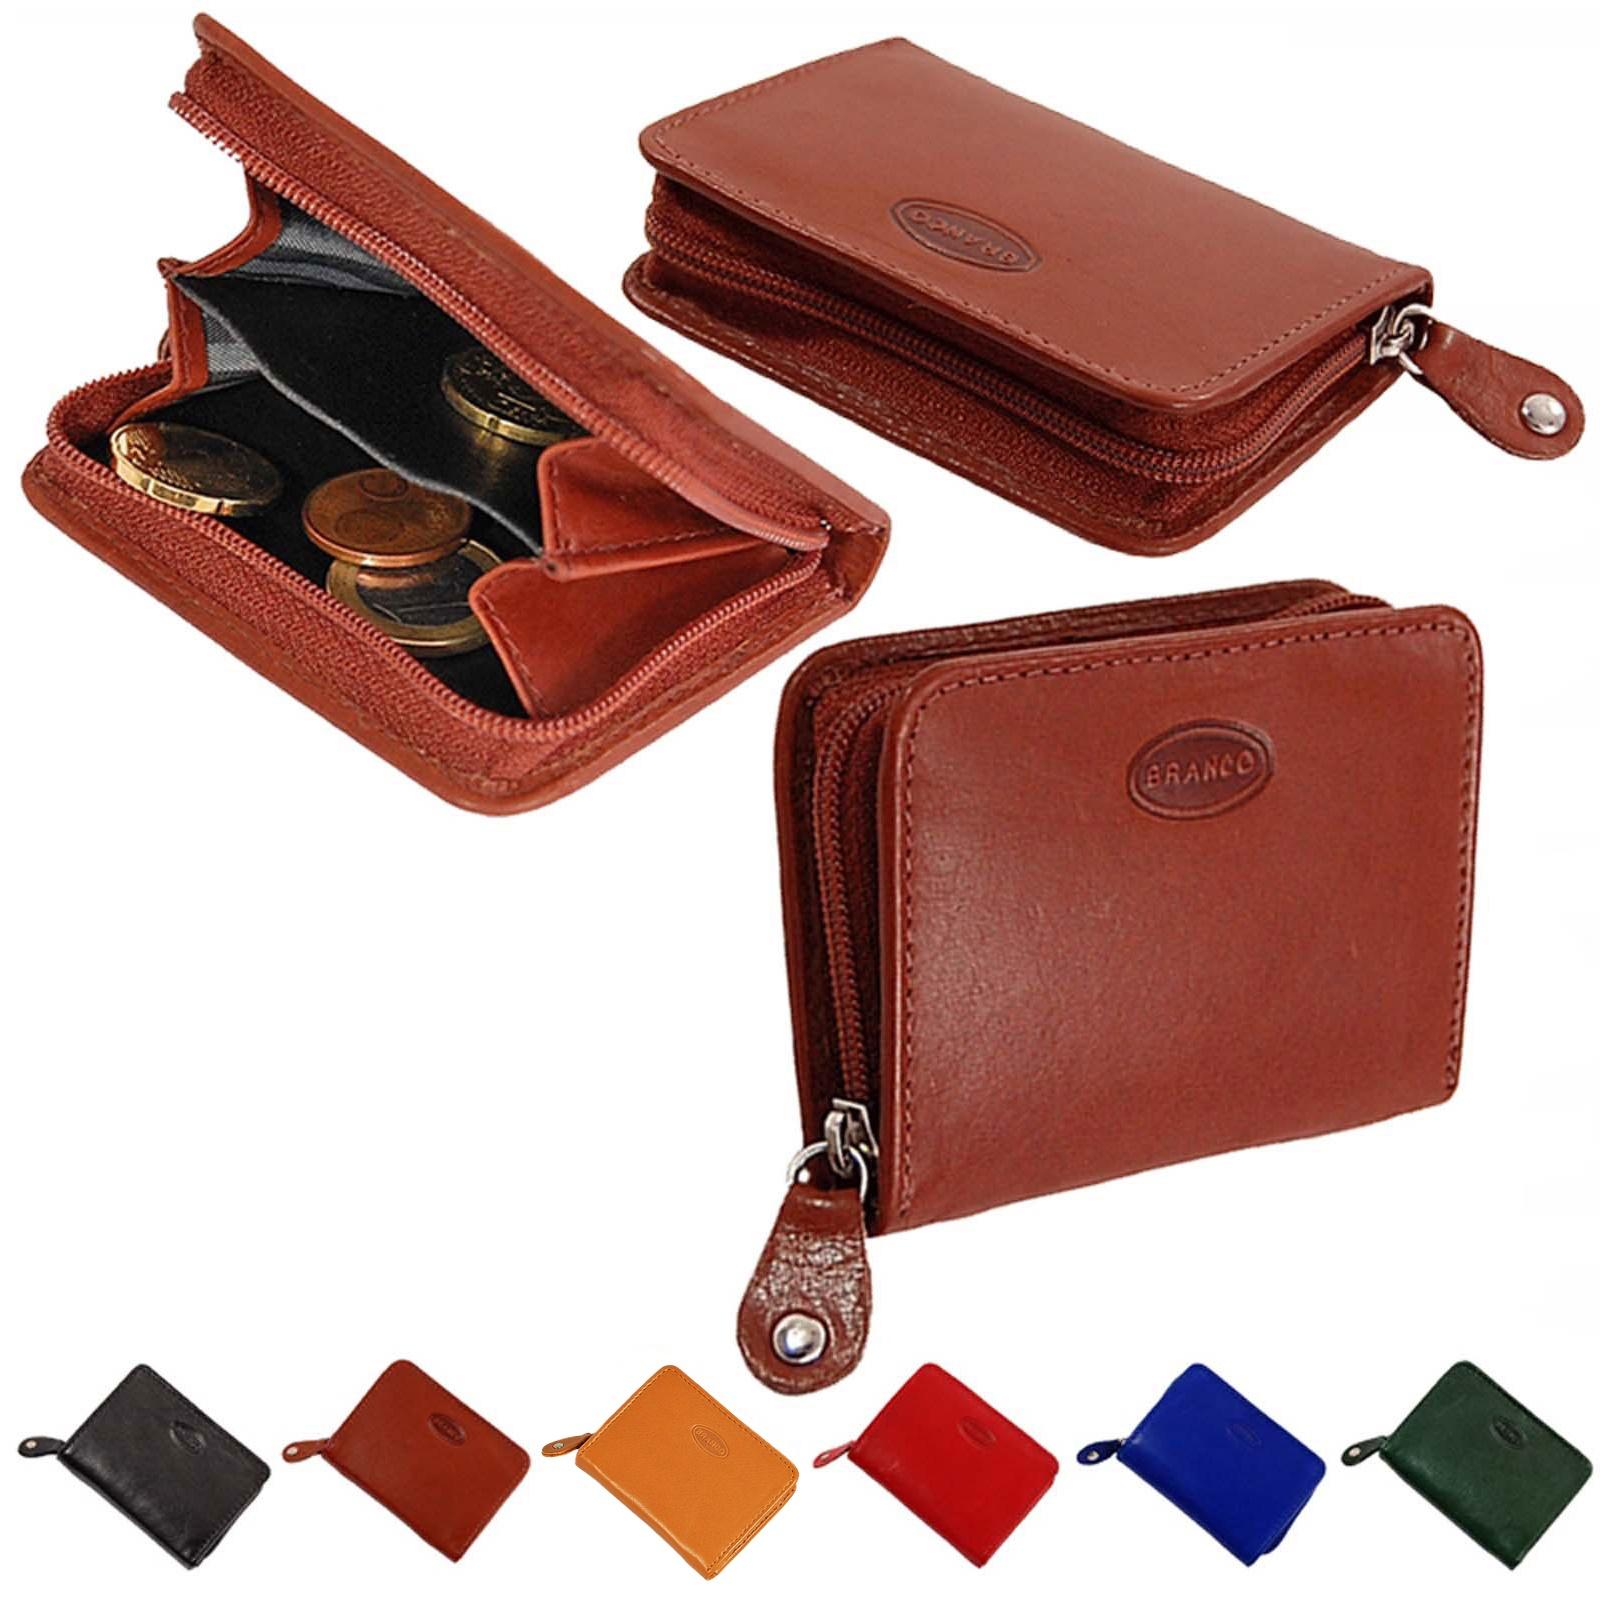 e65e7025c1f56 Mini Leder Reißverschluss Geldbörse Geldbeutel Portemonnaie kleine Börse  Münzbörse 107